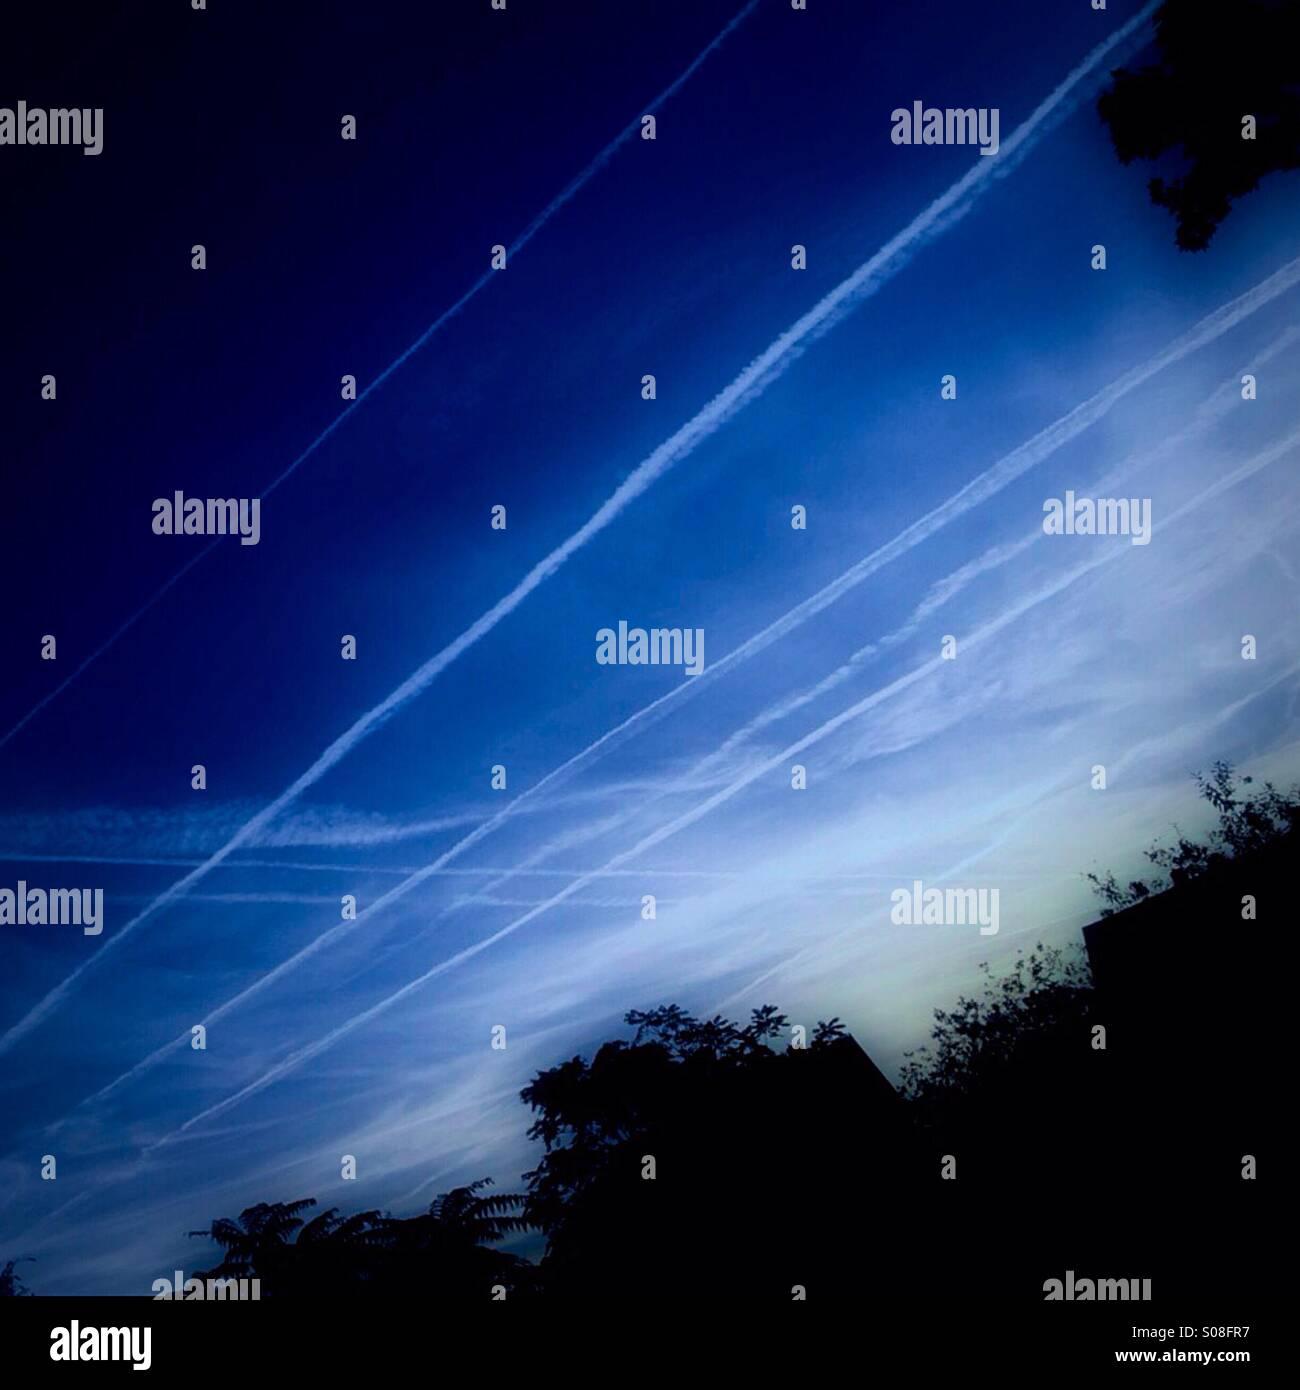 Skylines - Stock Image